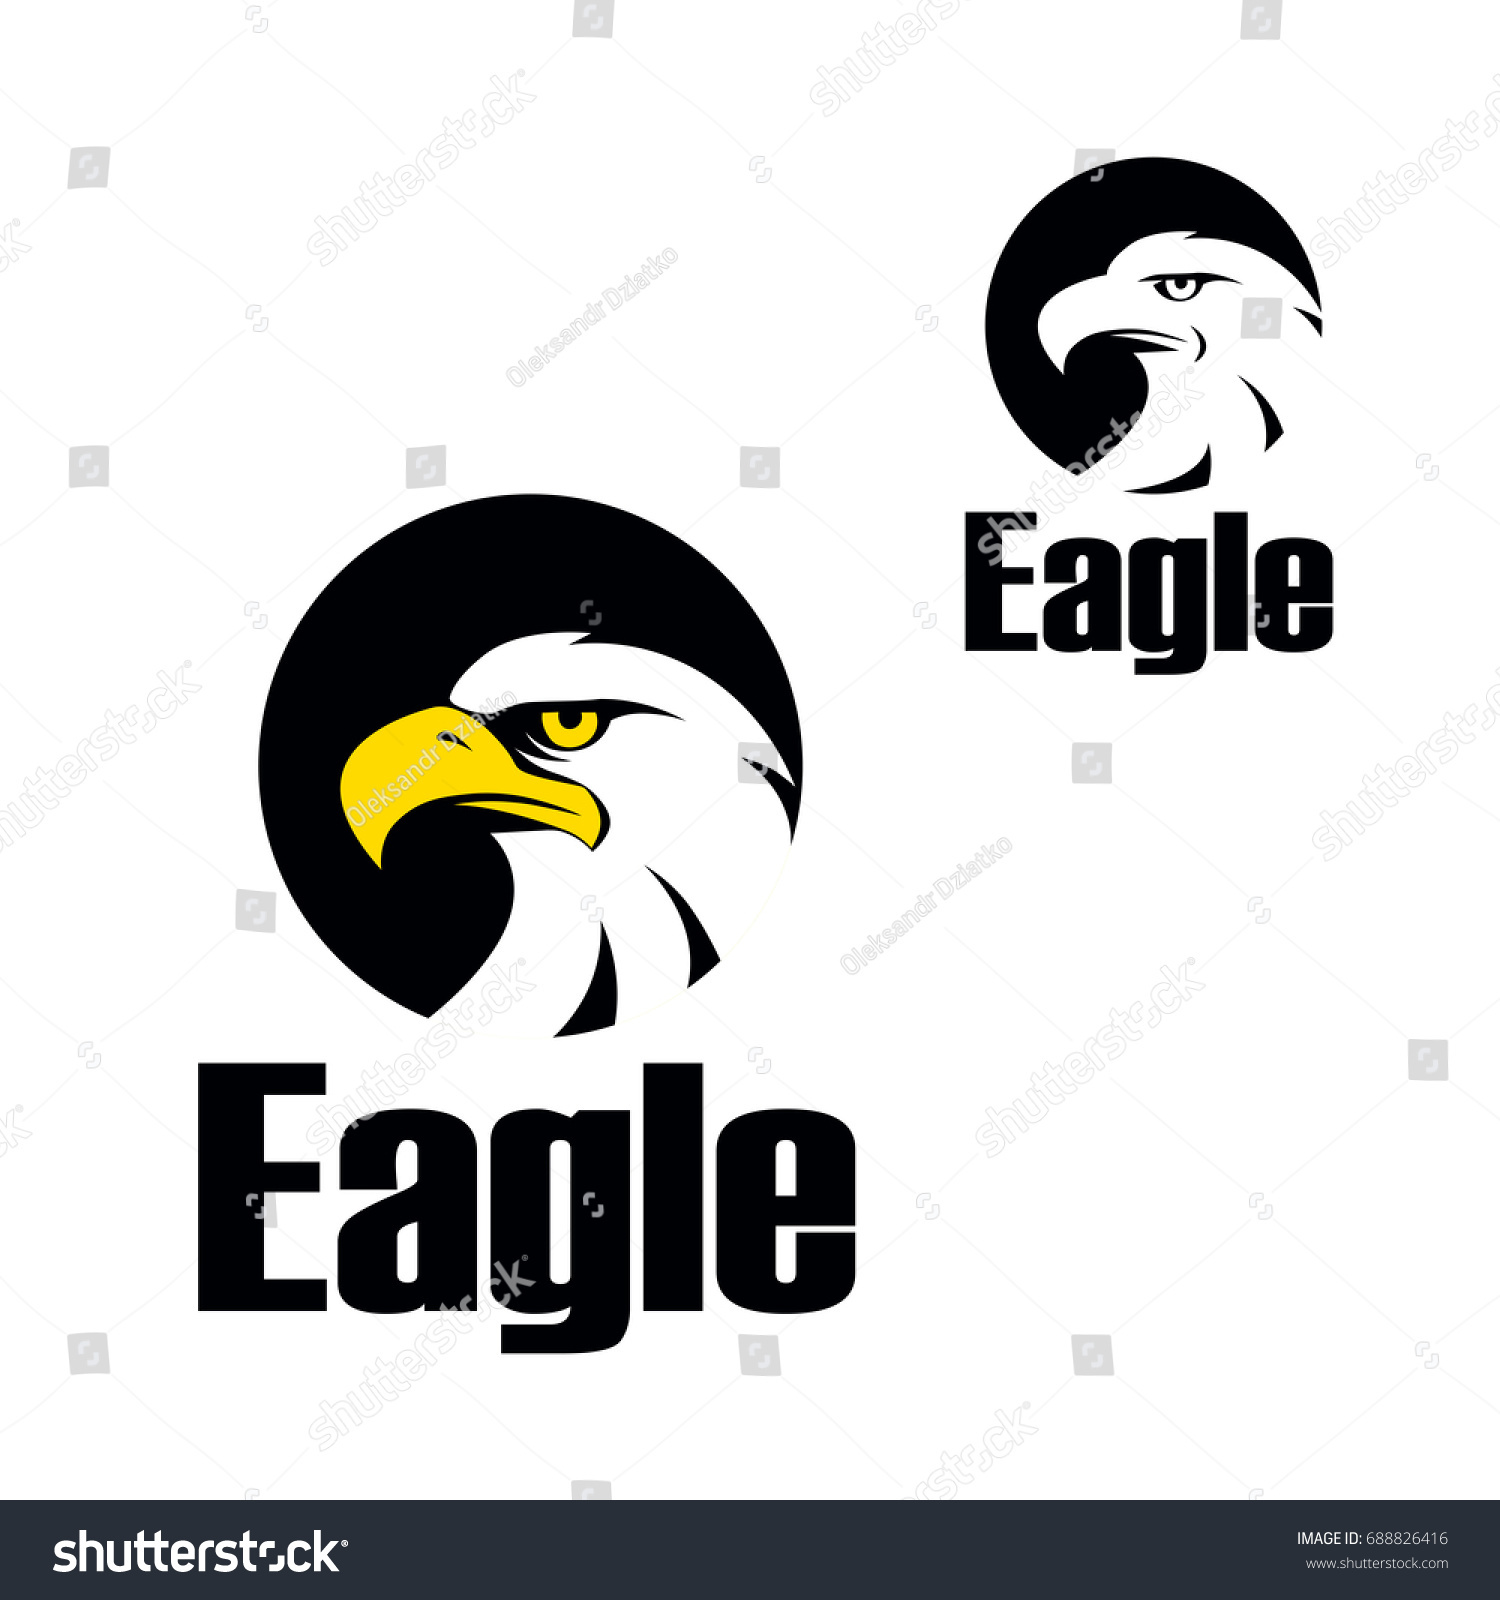 Eagle icon symbol eagle hawk predator stock vector 688826416 eagle icon symbol of eagle hawk predator for sport team mascot biocorpaavc Images